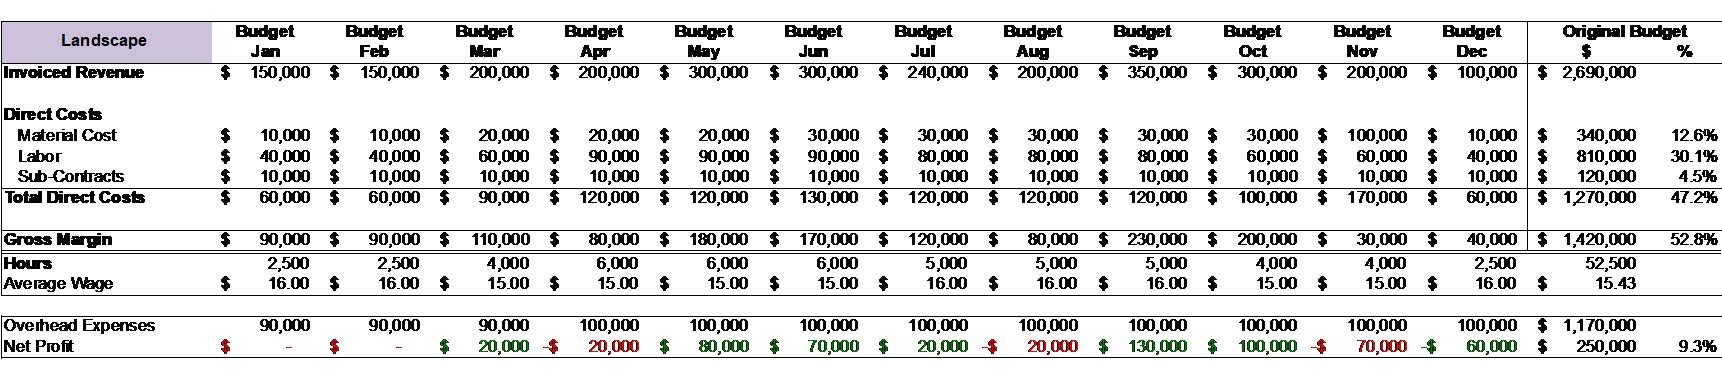 Starting Budget